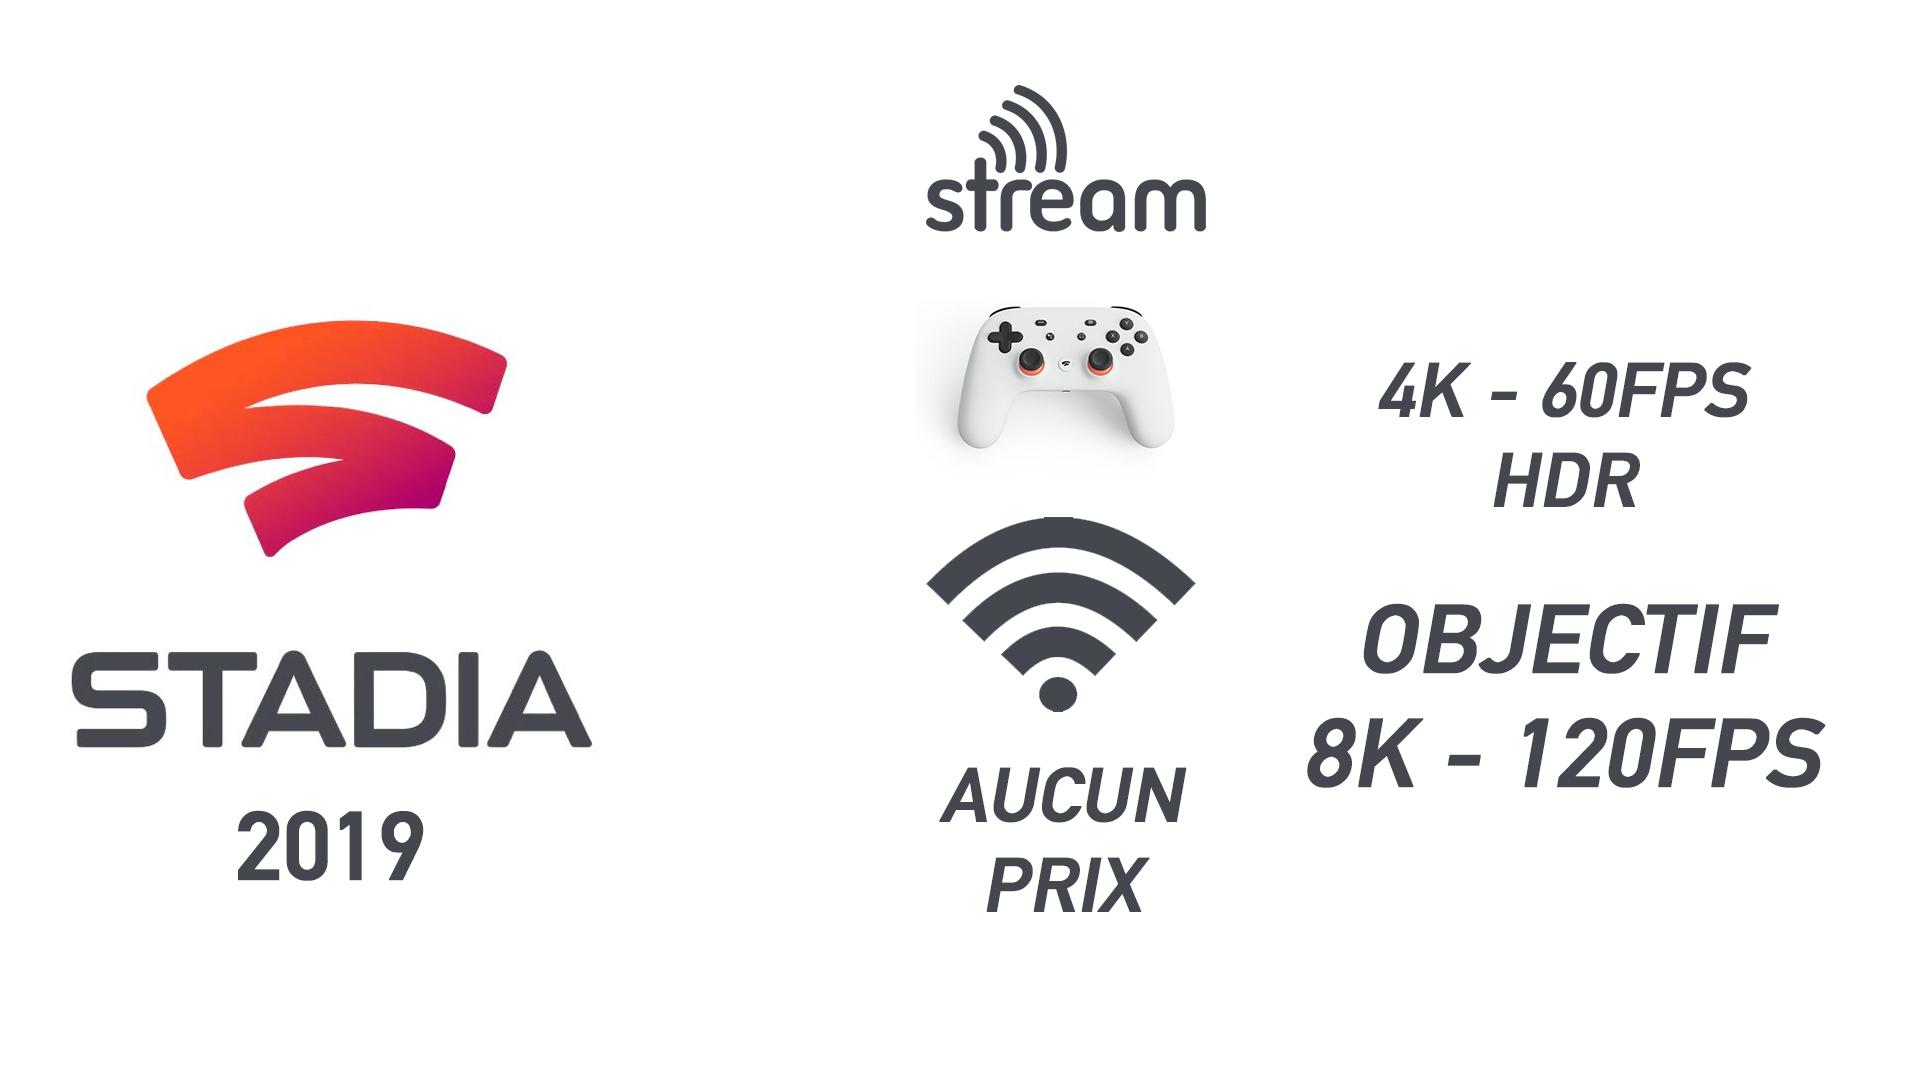 Google Stadia Services